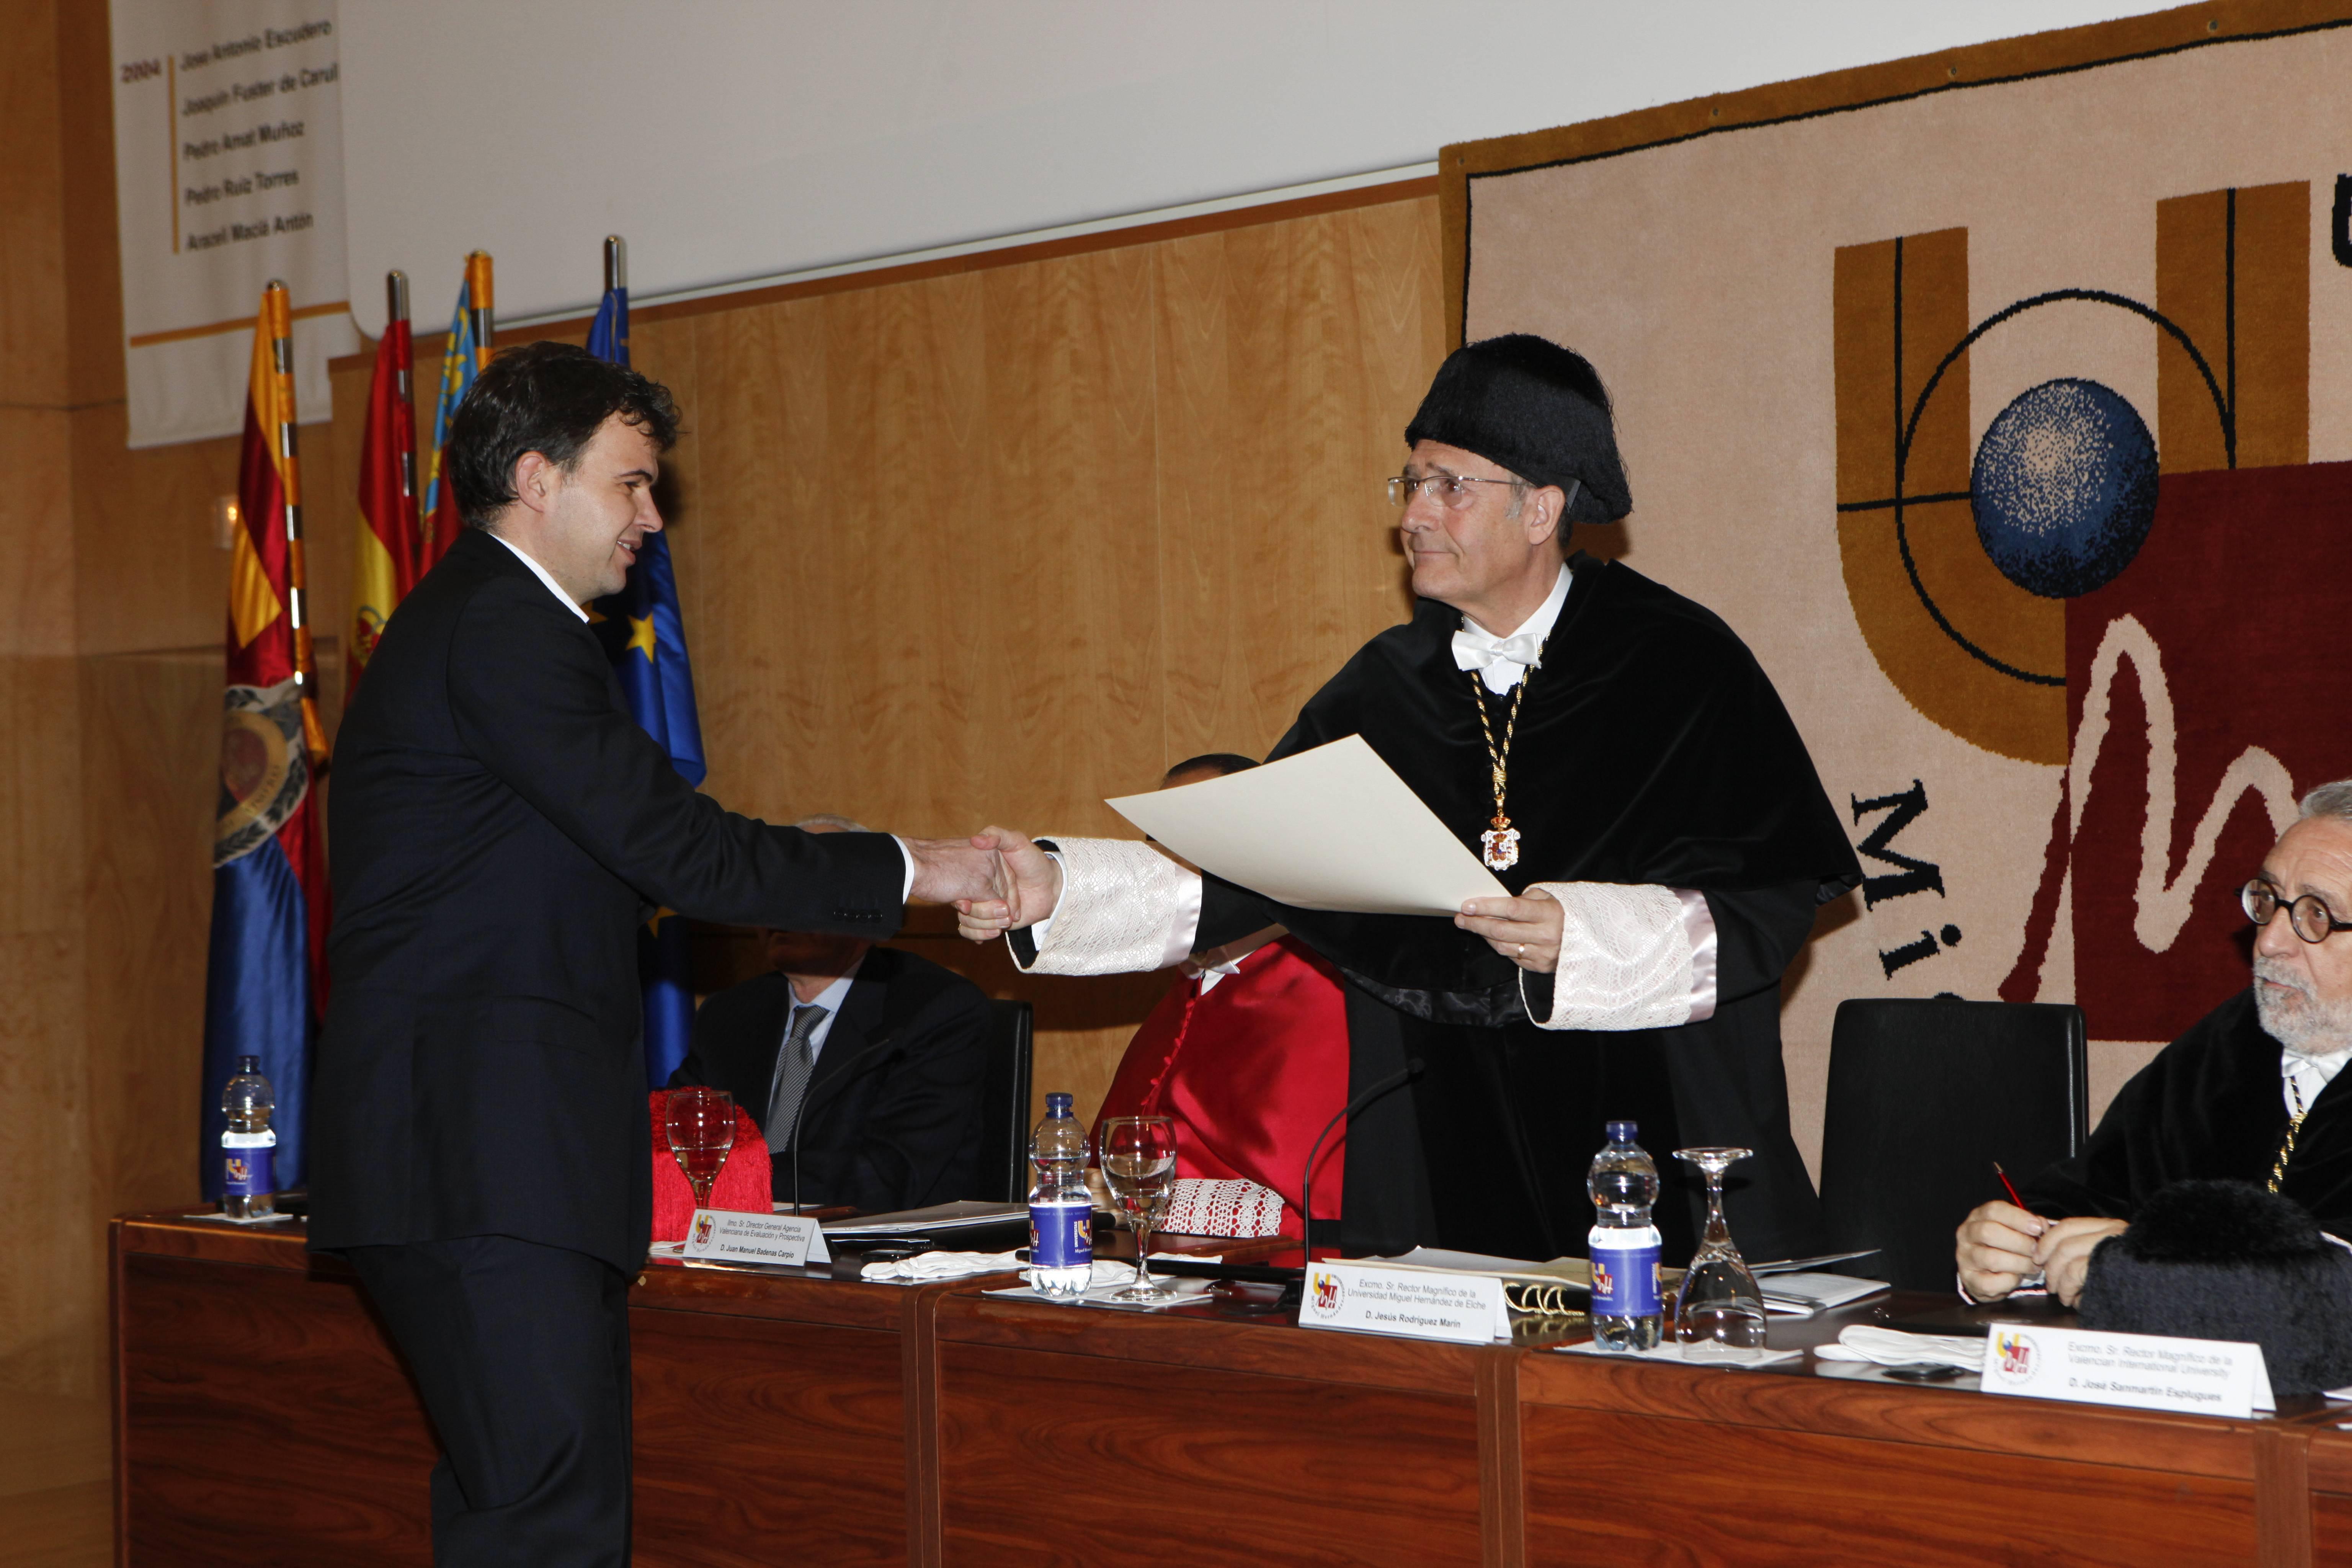 doctor-honoris-causa-luis-gamir_mg_1036.jpg